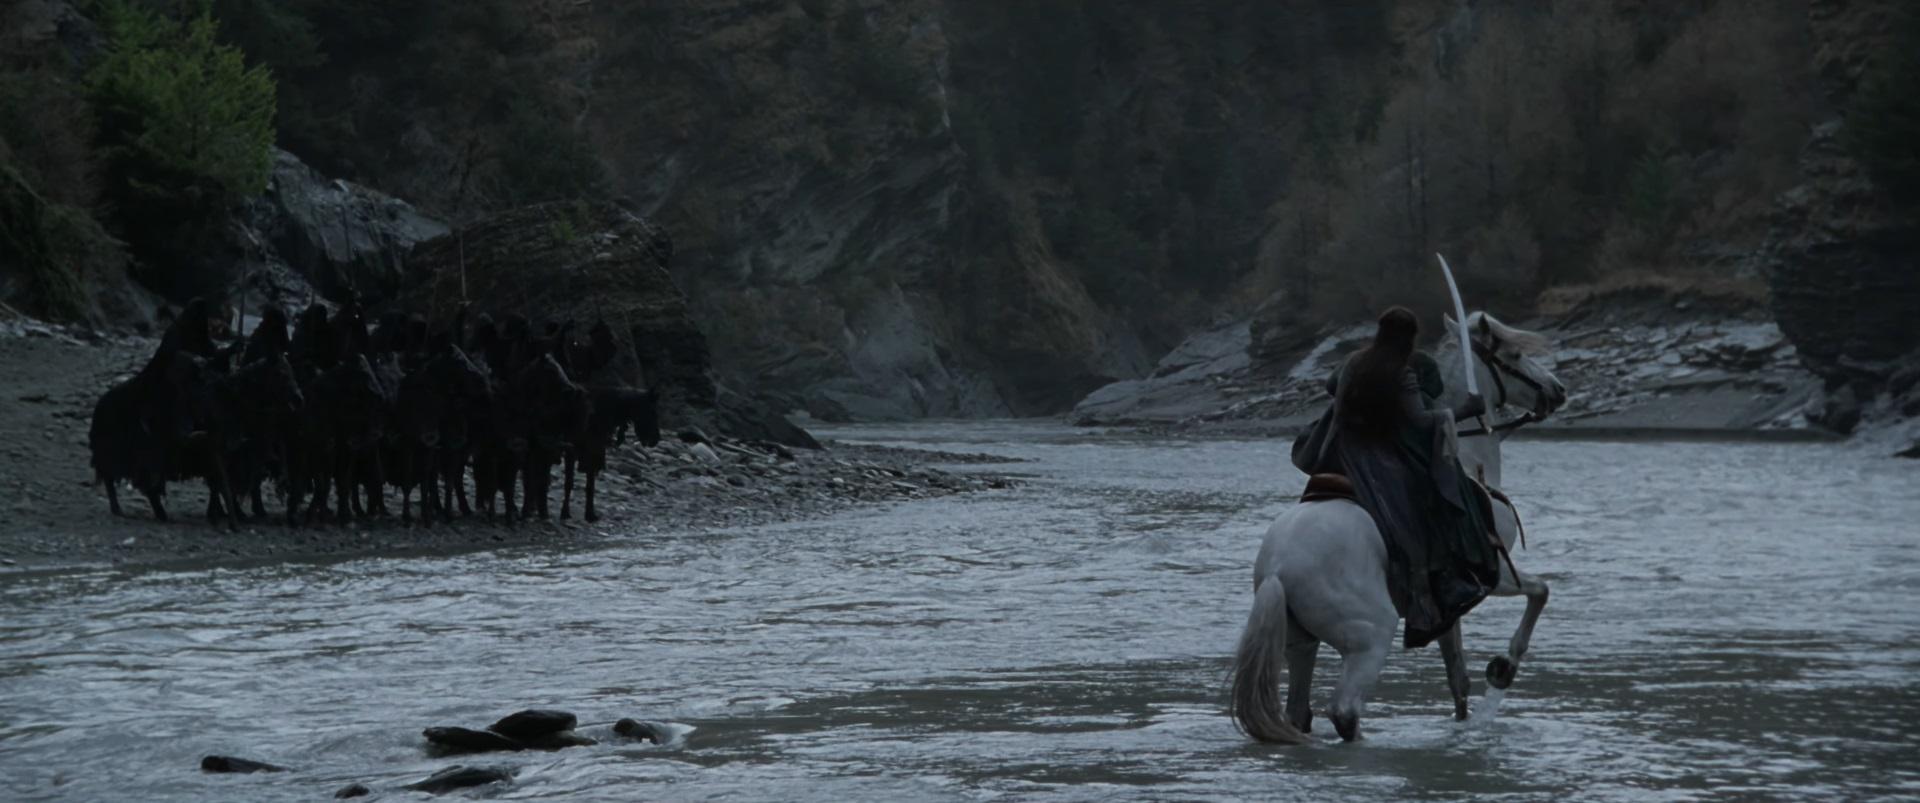 Fellowship-River.jpg